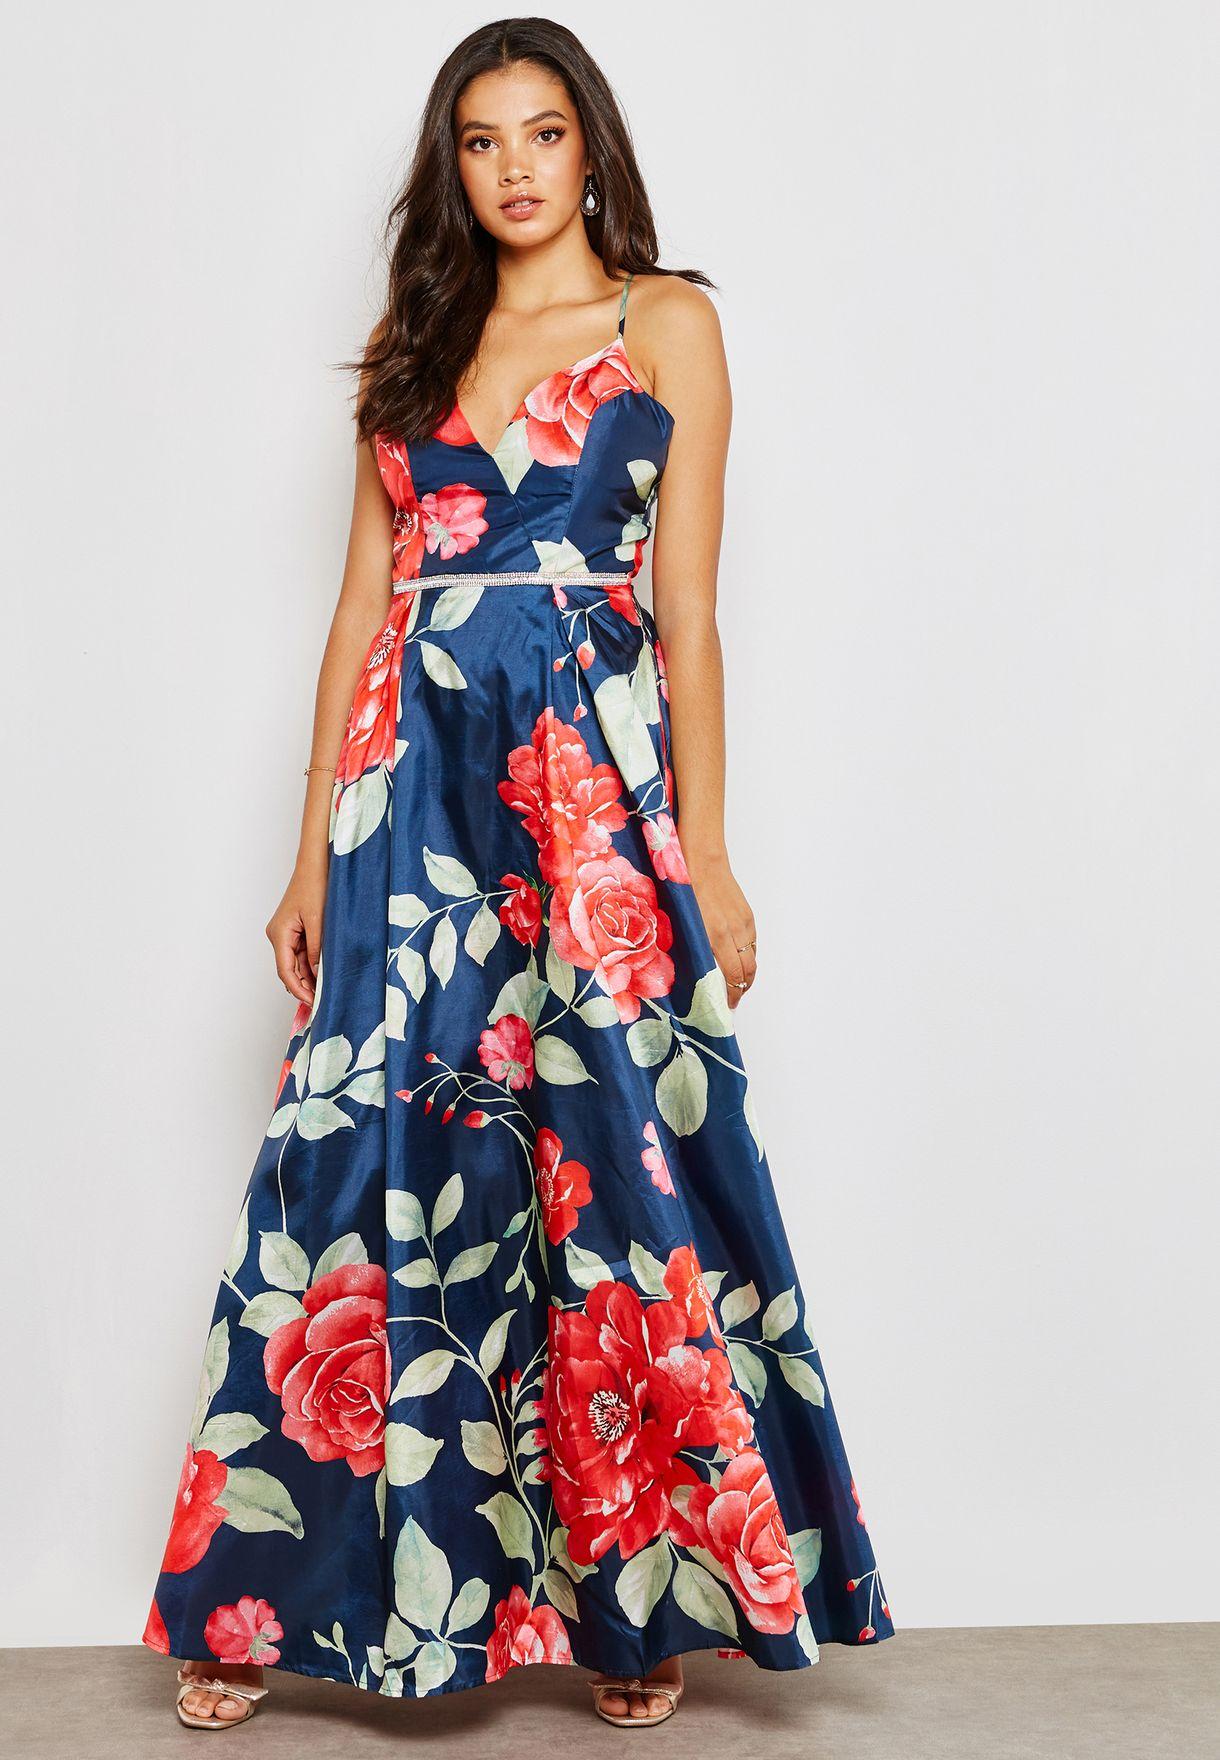 Floral Print Cross Back Dress